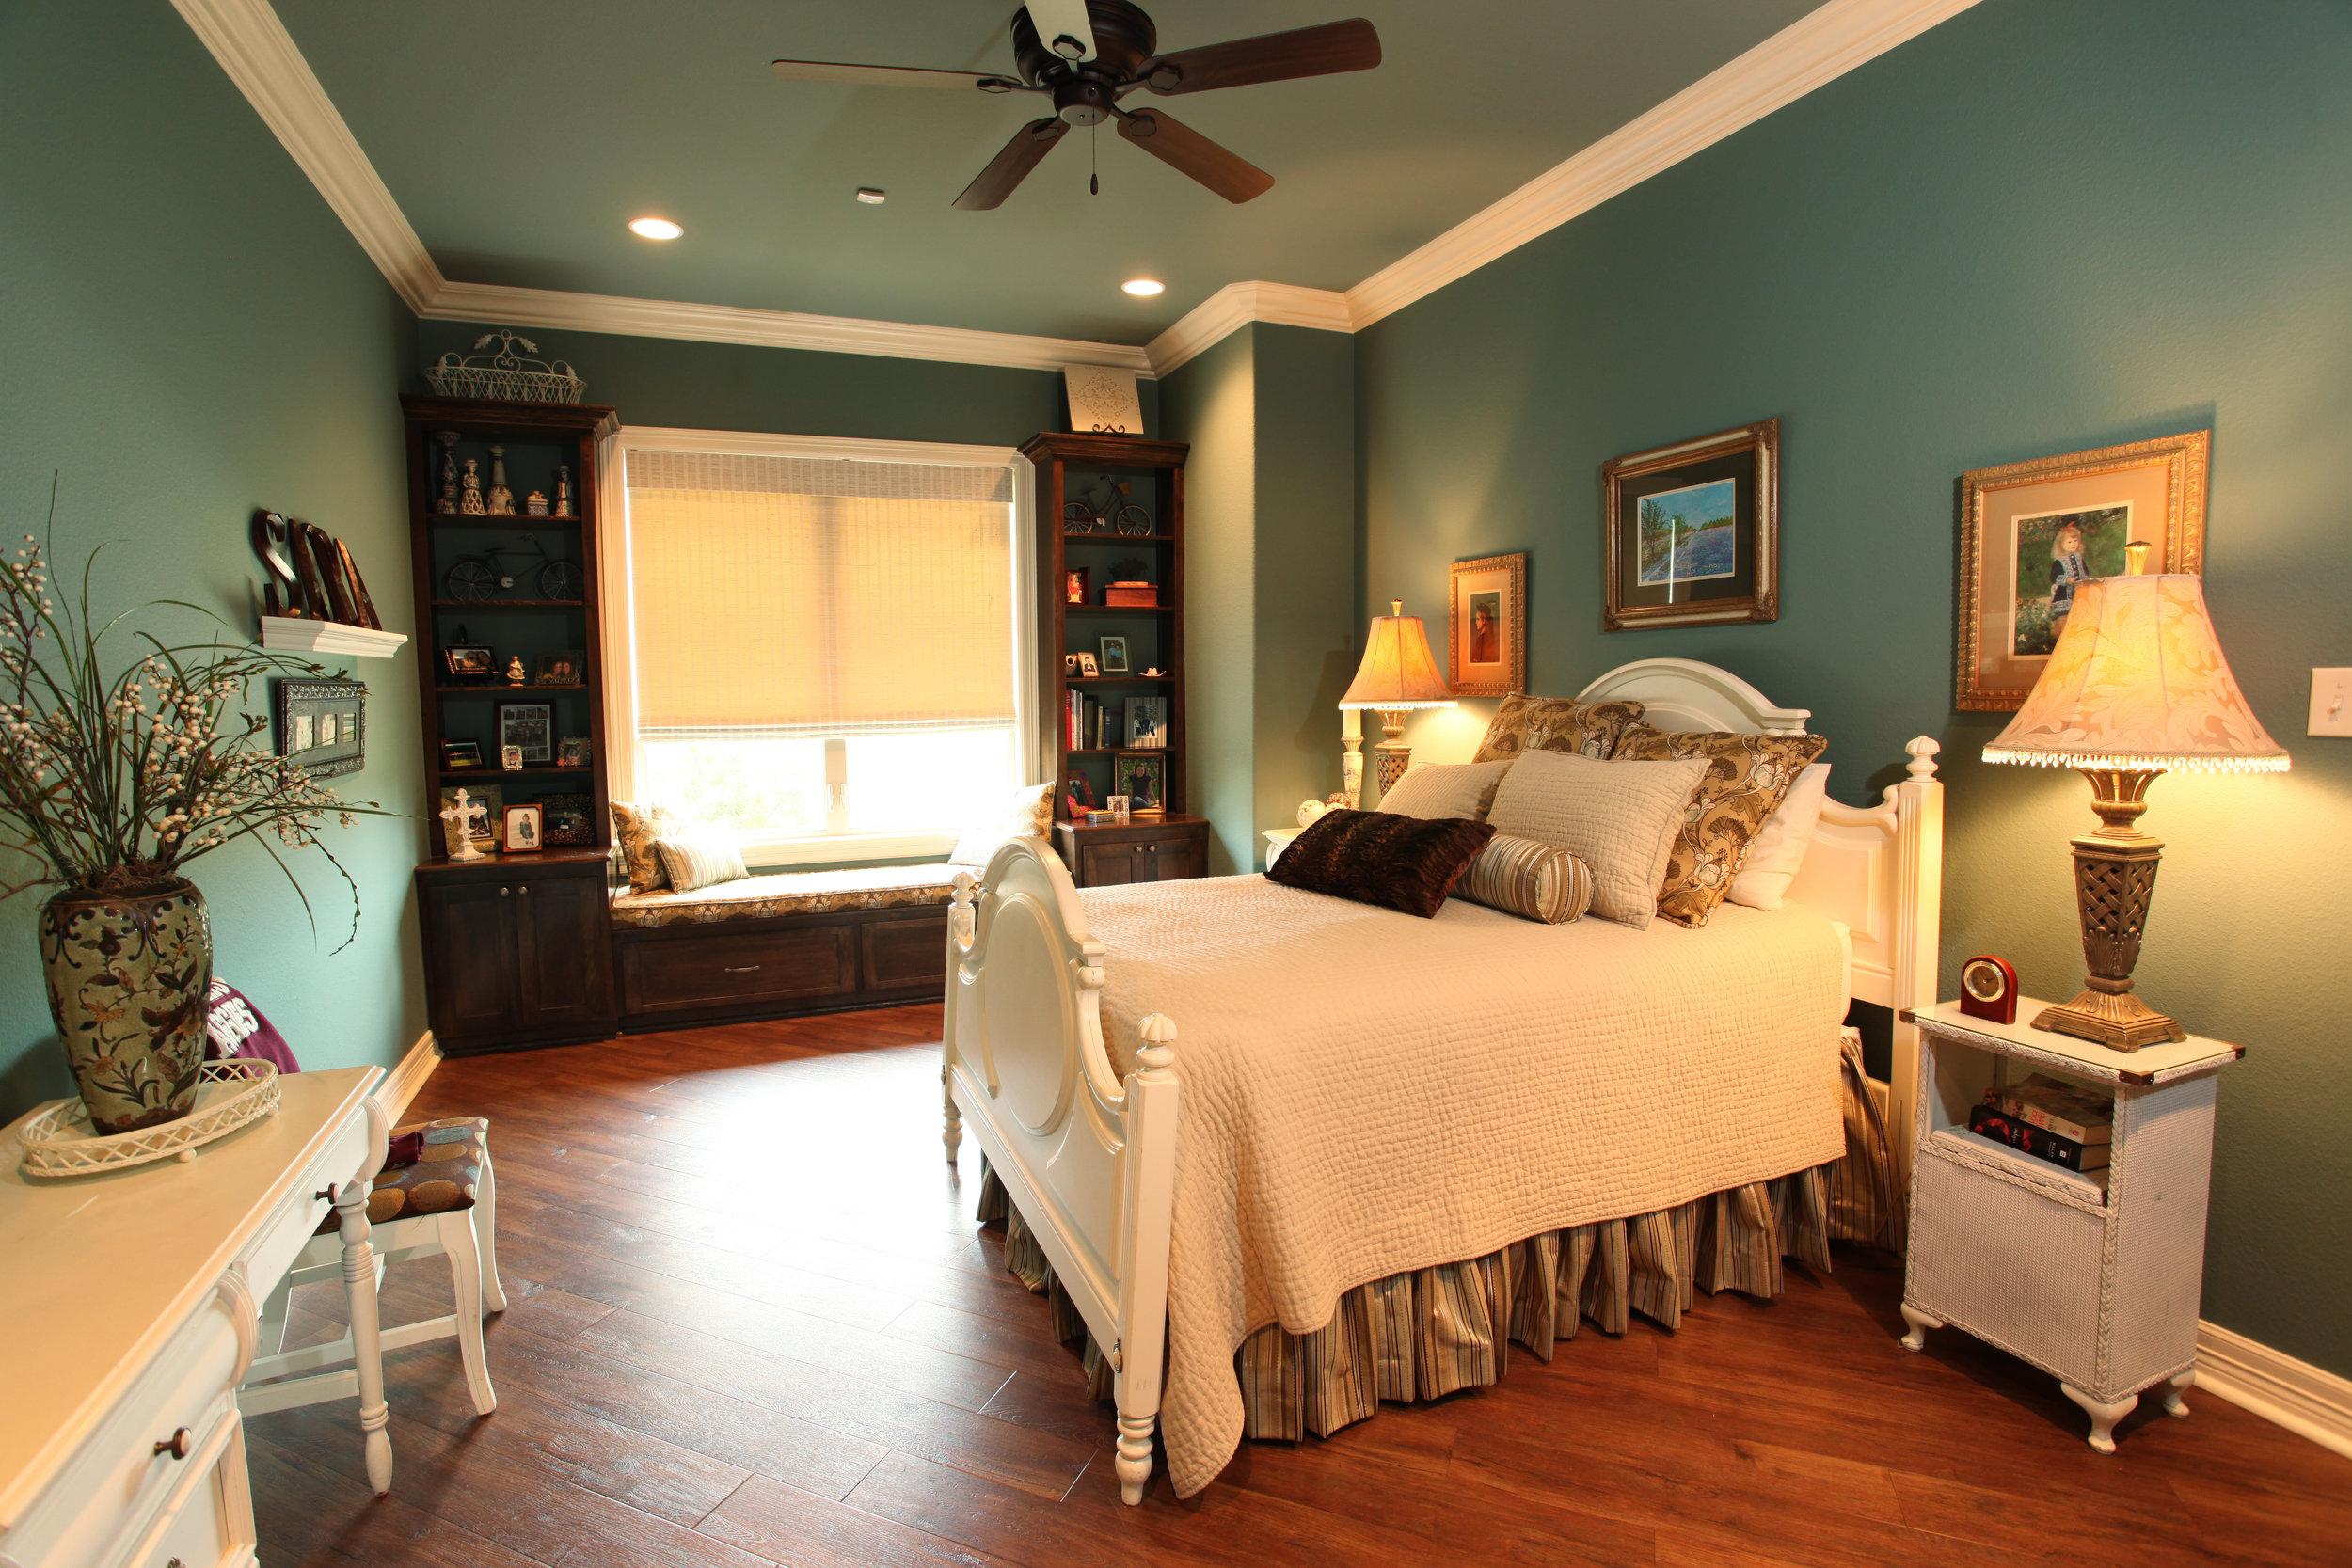 jillornelas.com/guestroom